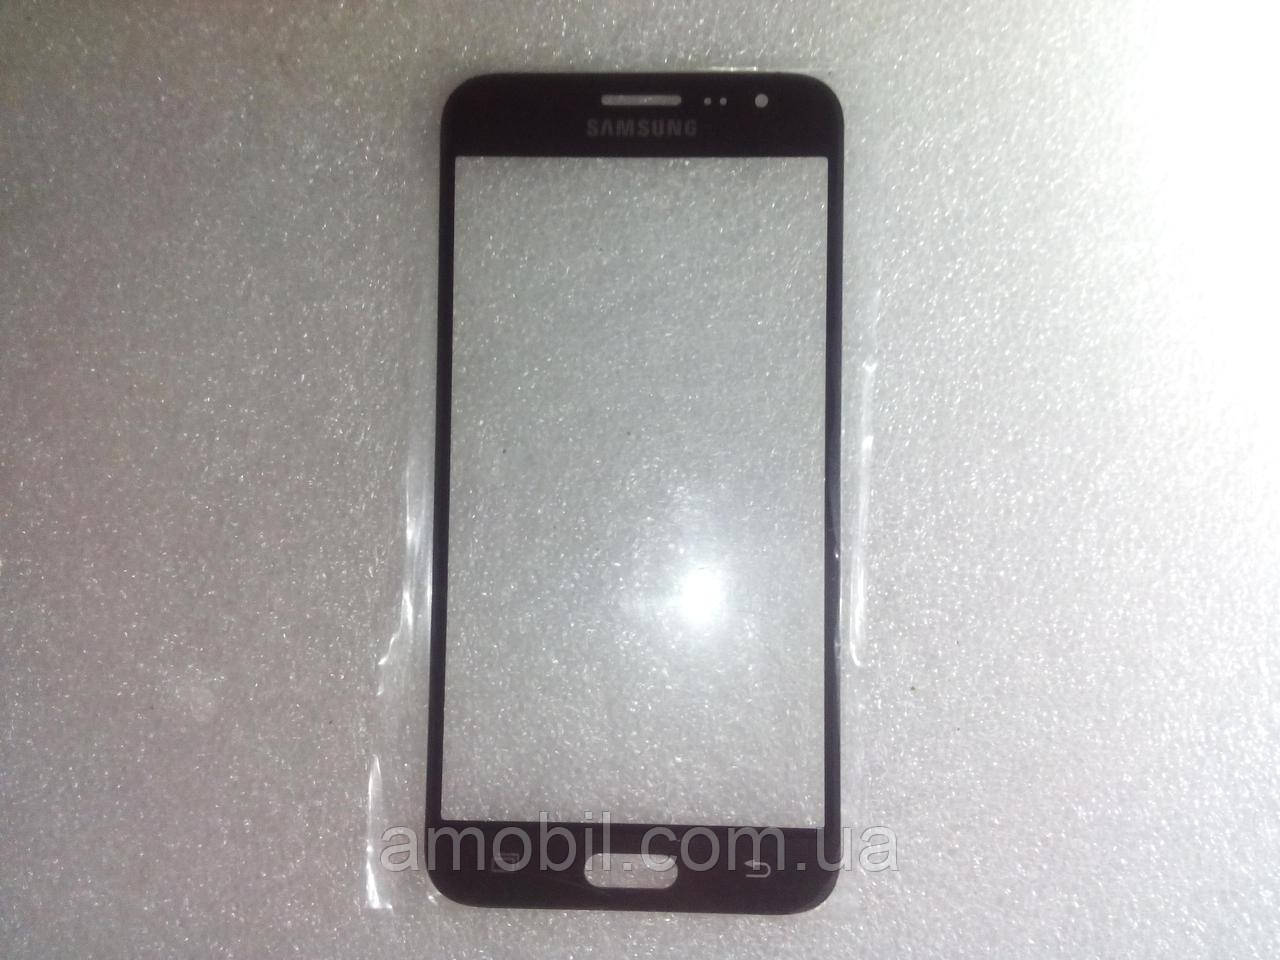 Стекло дисплея Samsung J320 Galaxy J3 Duos,чёрное